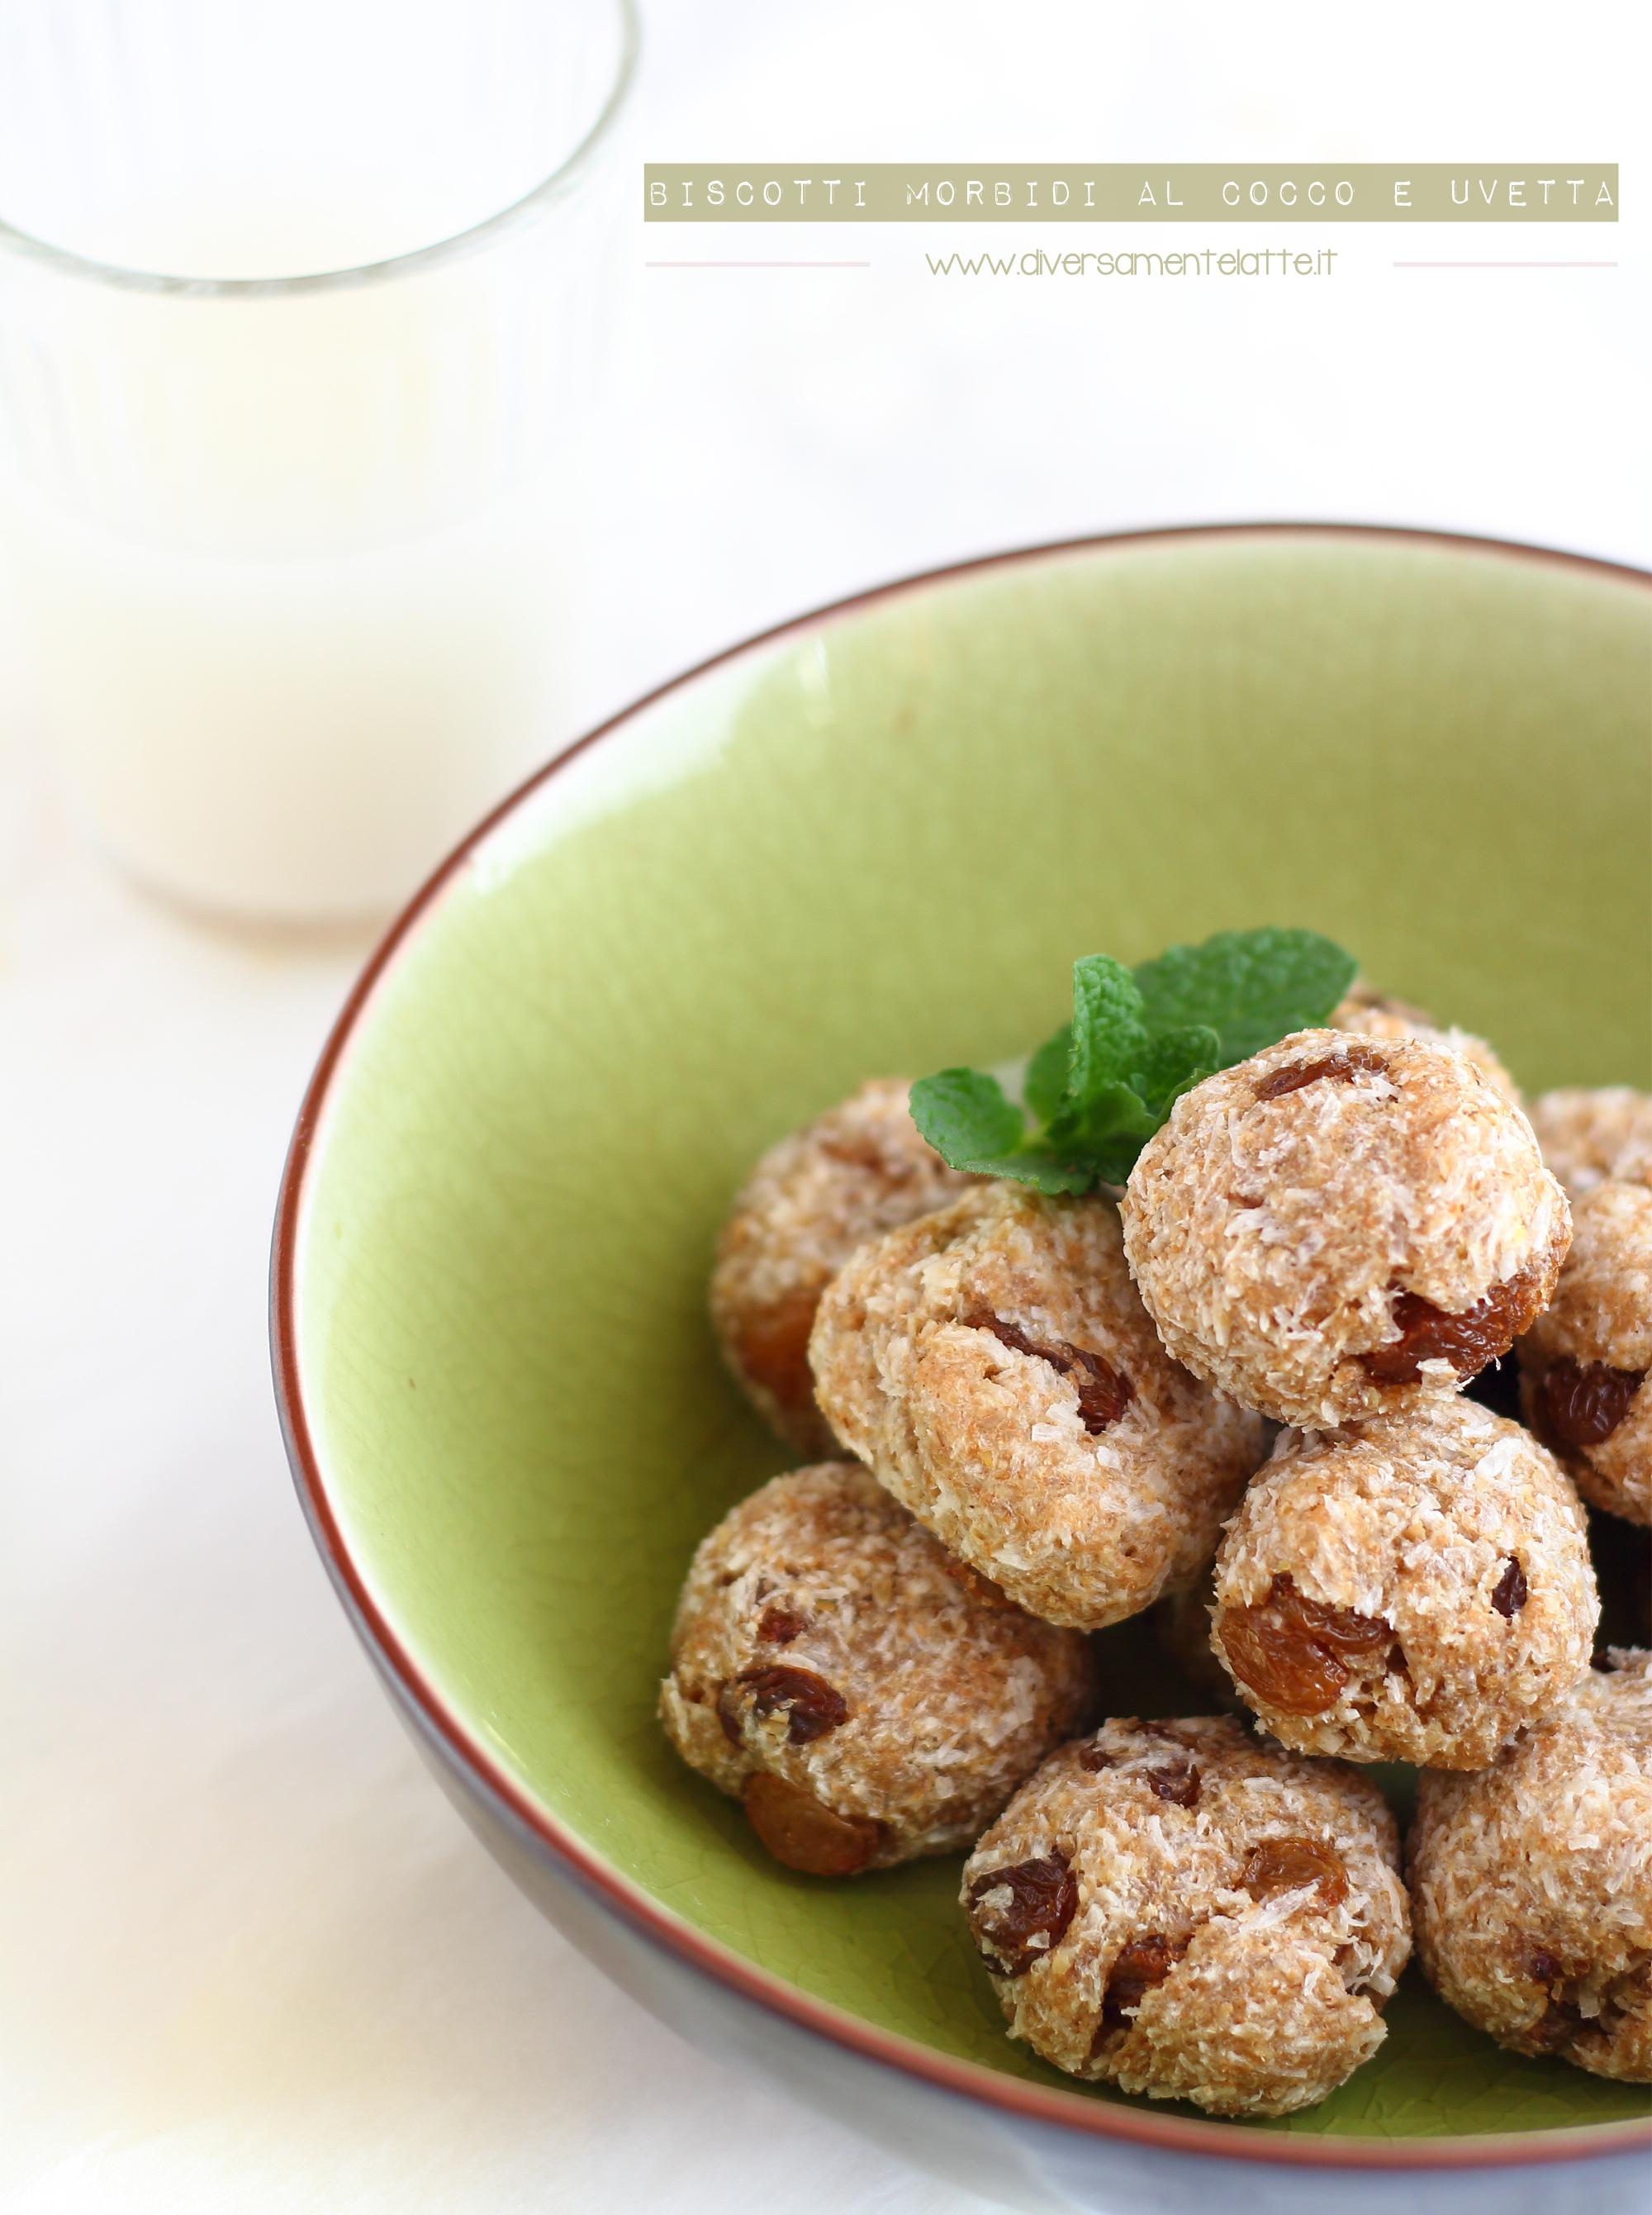 biscotti morbidi con okara